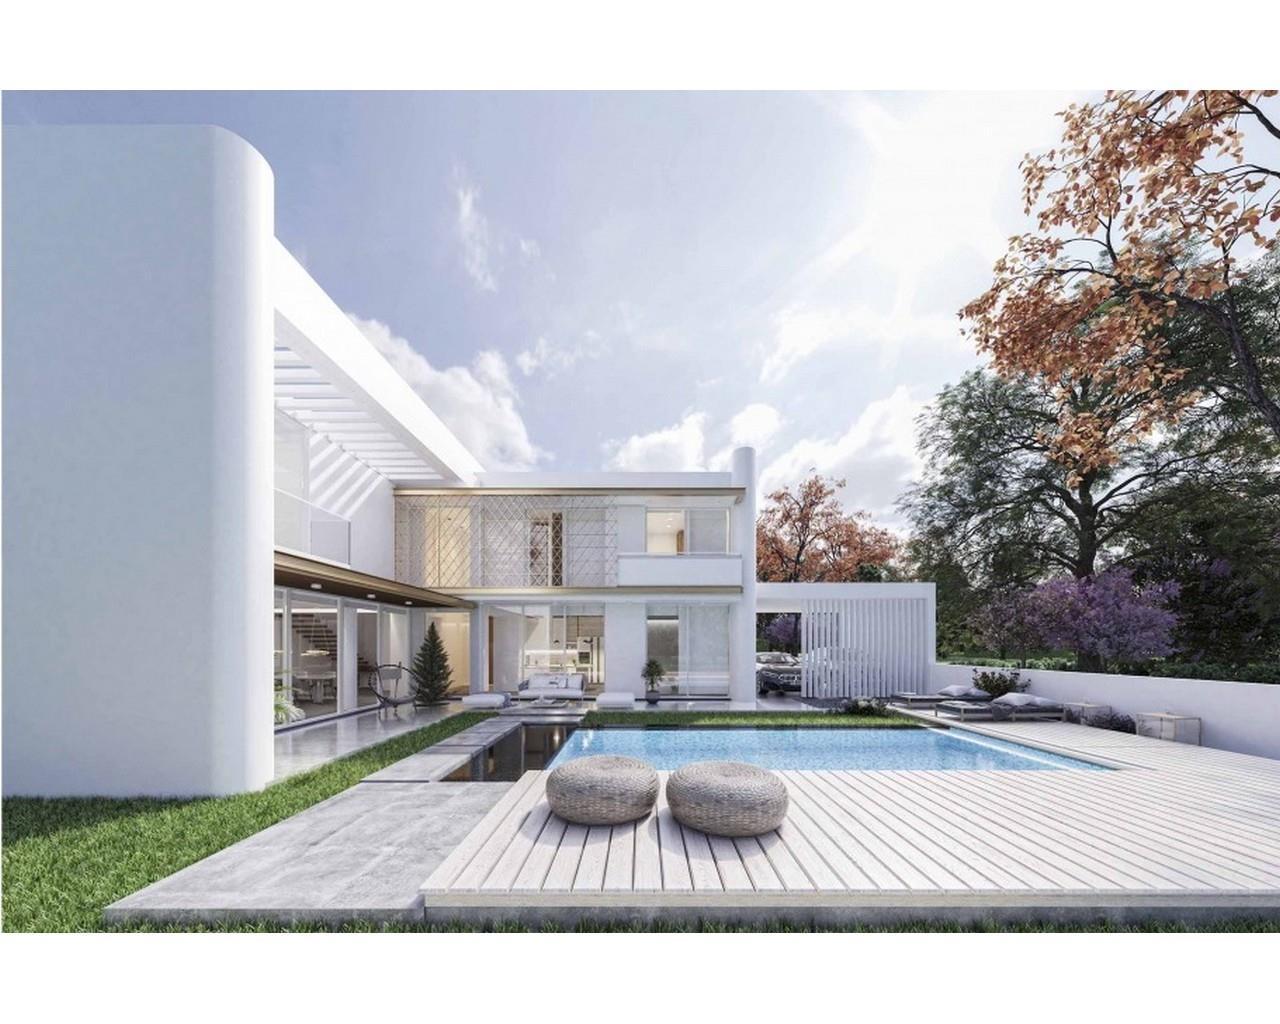 House Nicosia(Strovolos)  5 Bedrooms 6 Bathrooms 370 SqMt fo.....